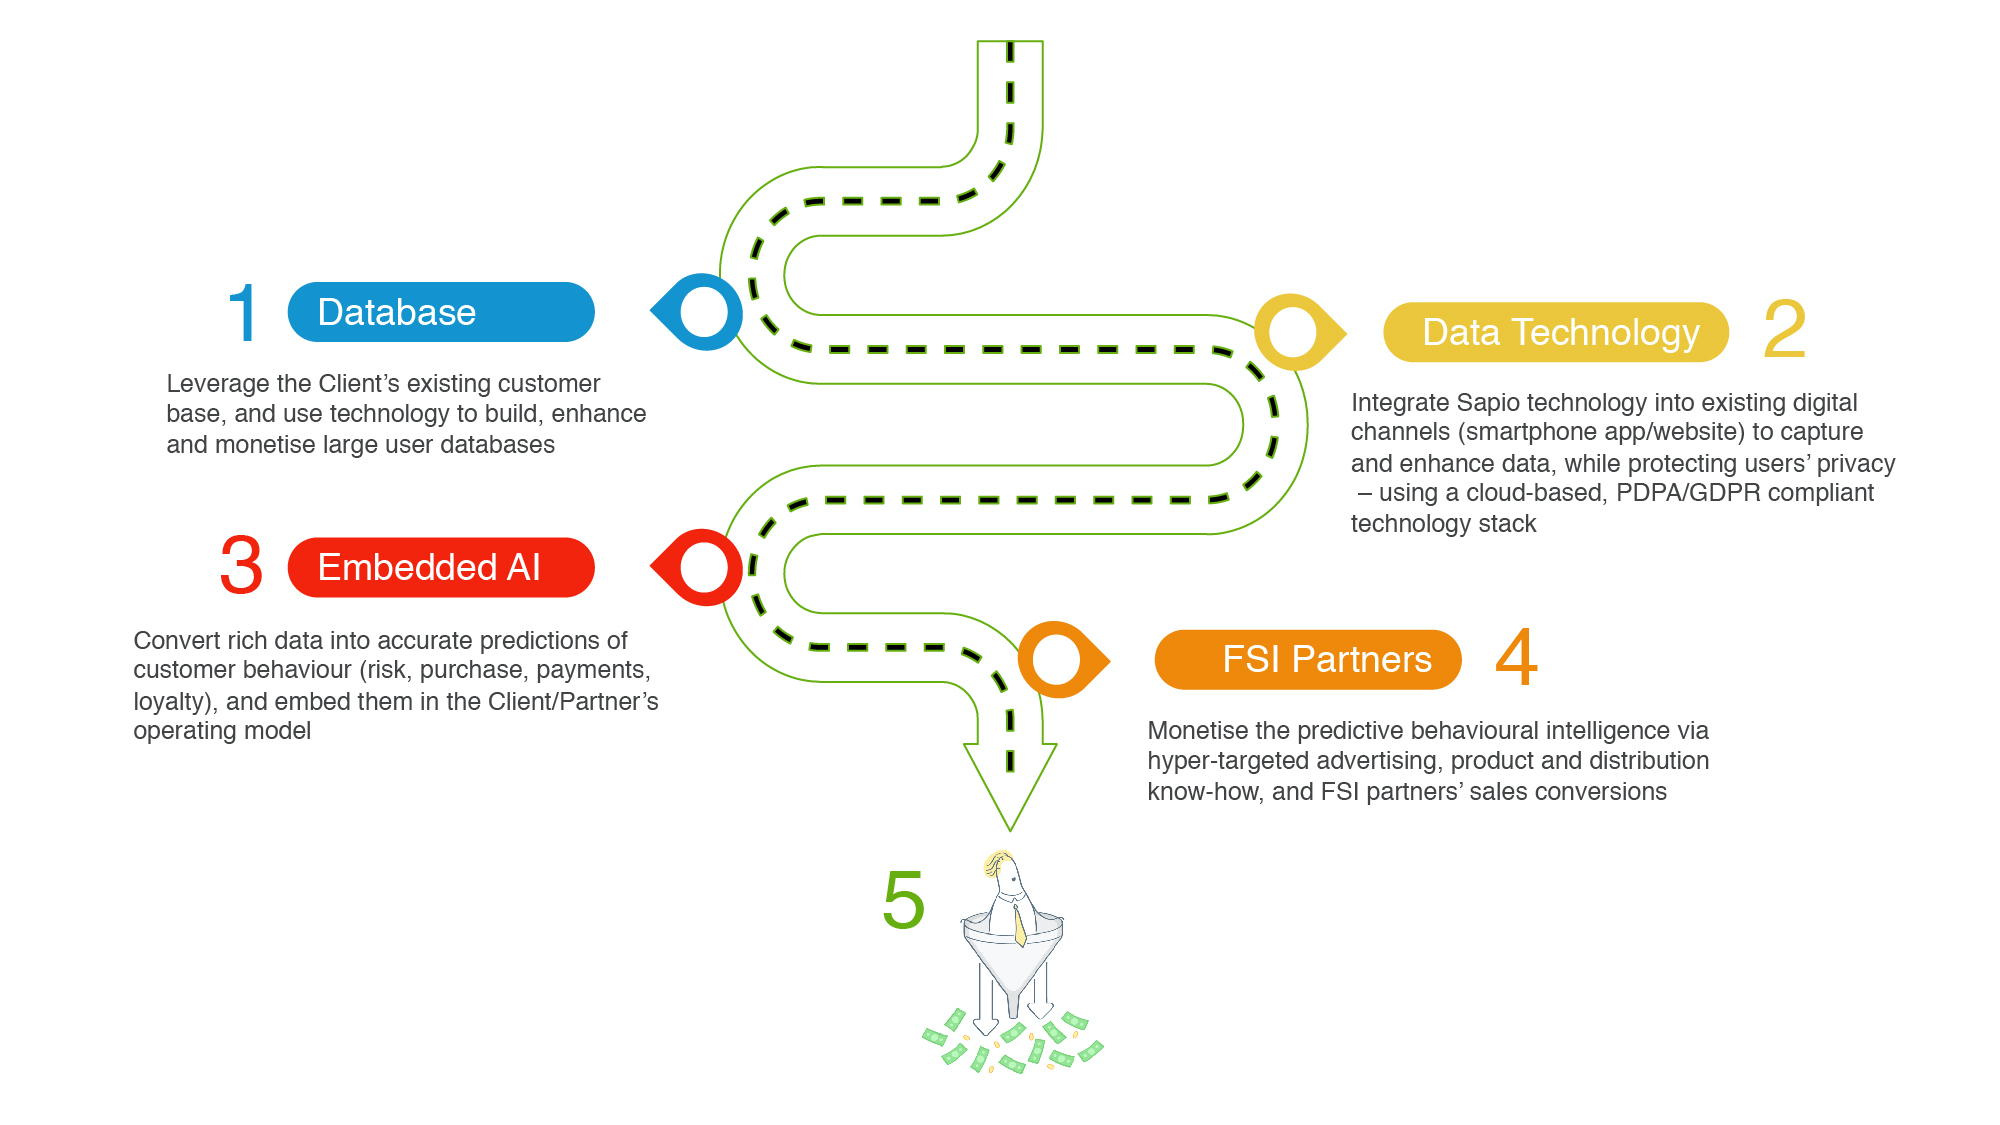 technical attributes fintech services asia ml thailand dlt blockchain sapio Indonesia